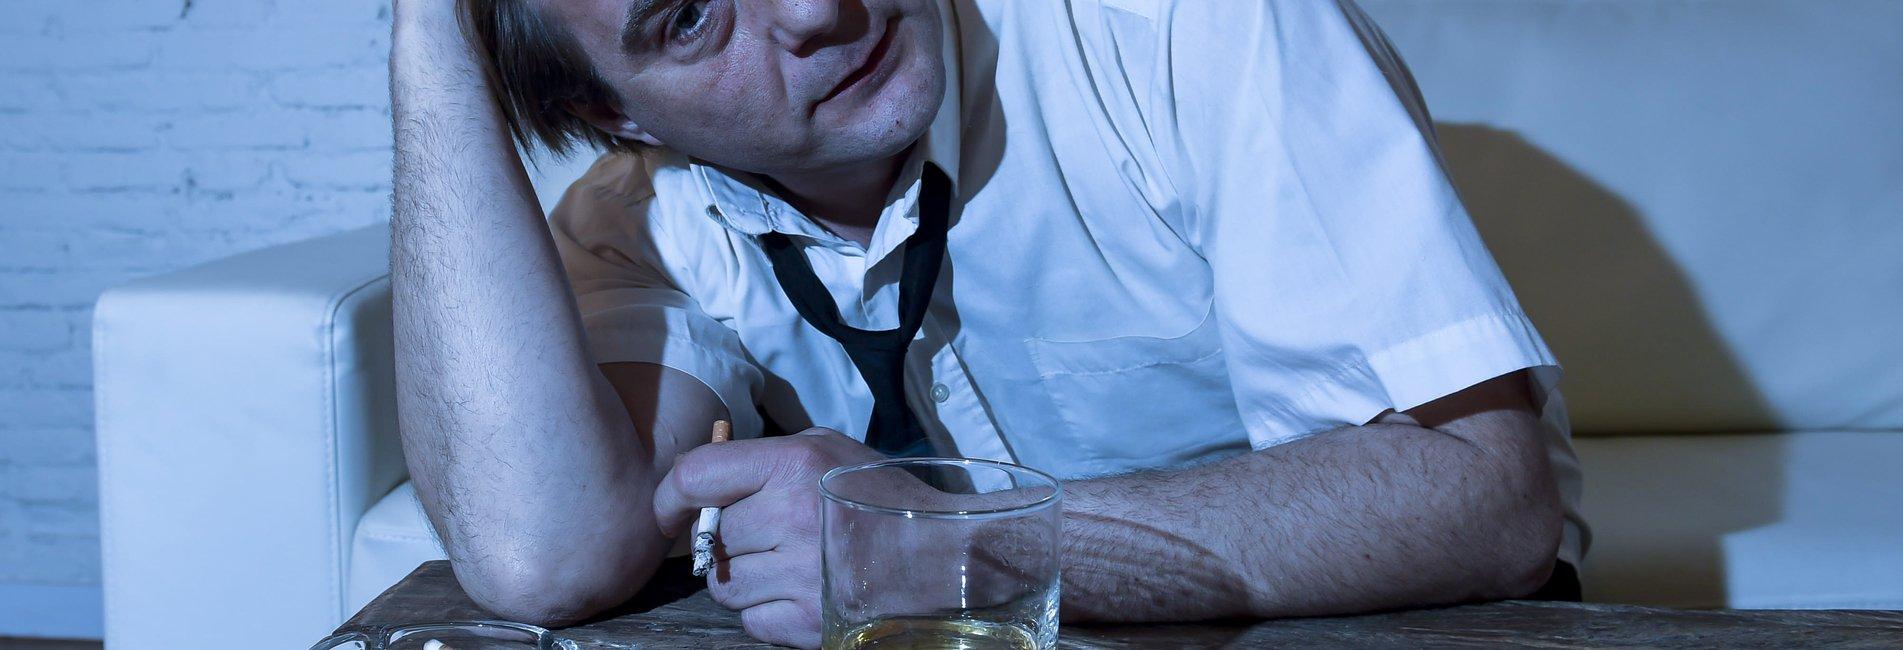 Biochemistry of Addiction Resurgence – A man fighting addiction smokes and drinks.